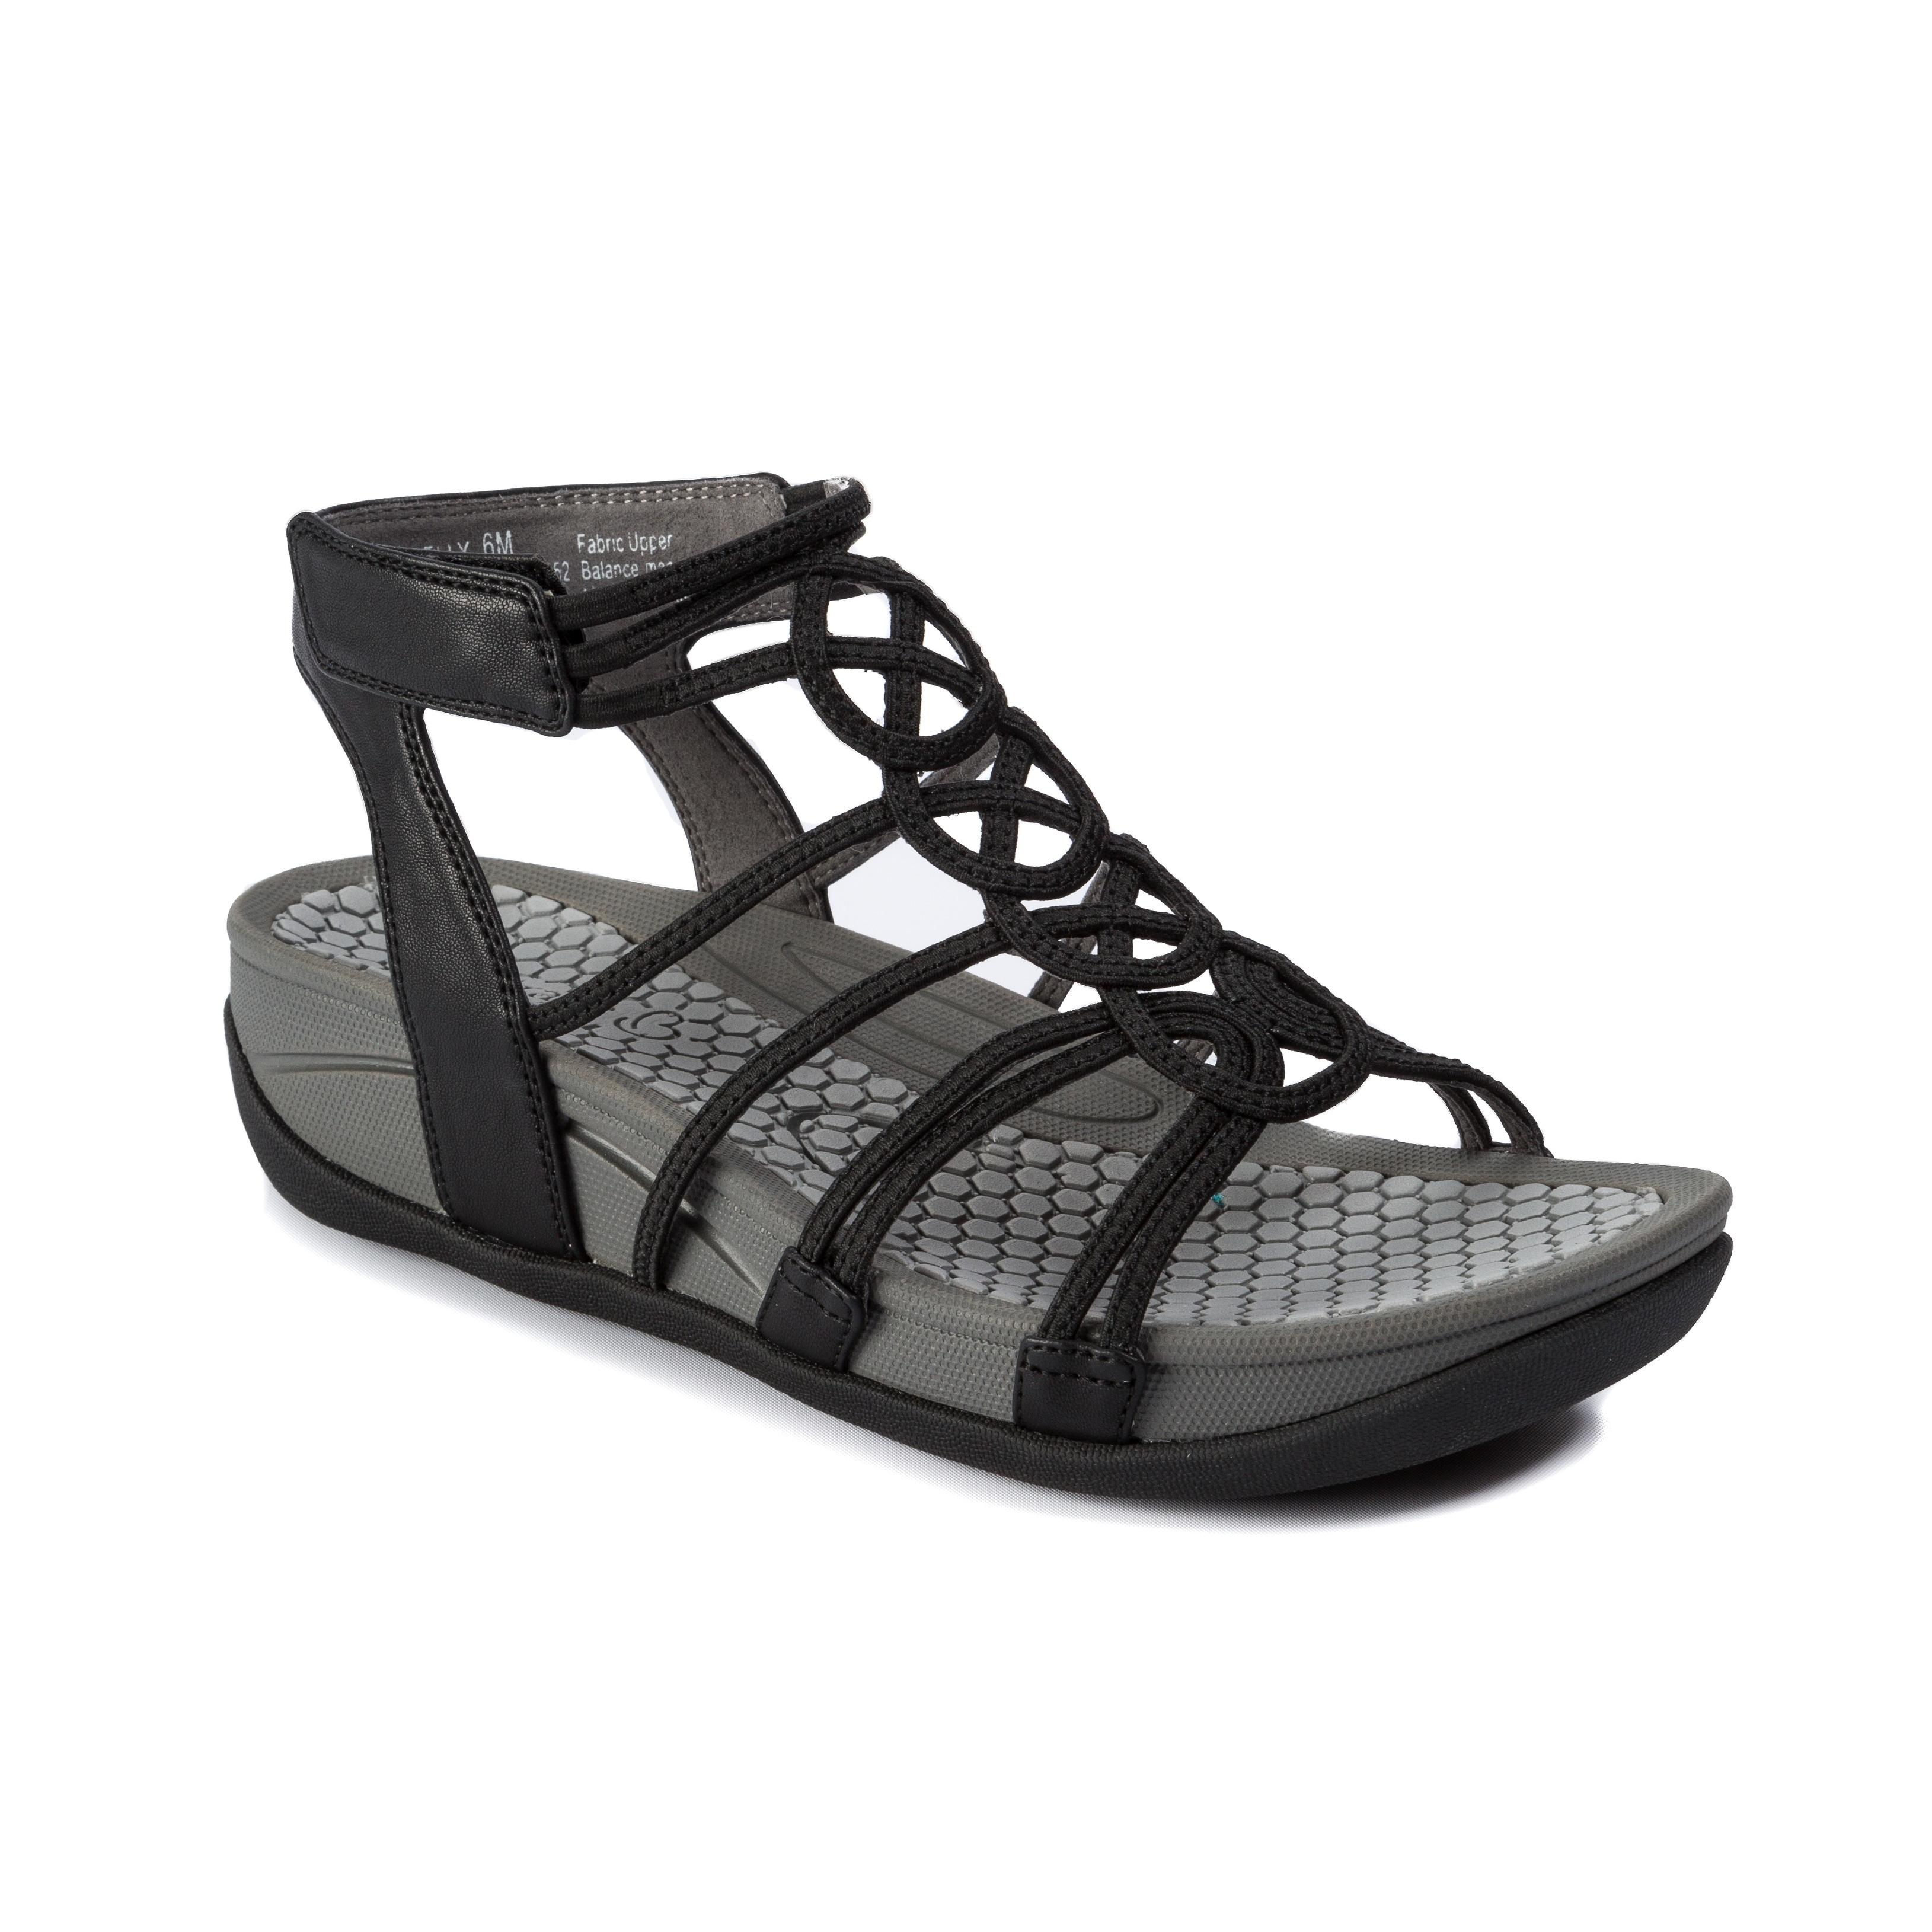 1bd38ba1c5b597 Baretraps Women s Shoes